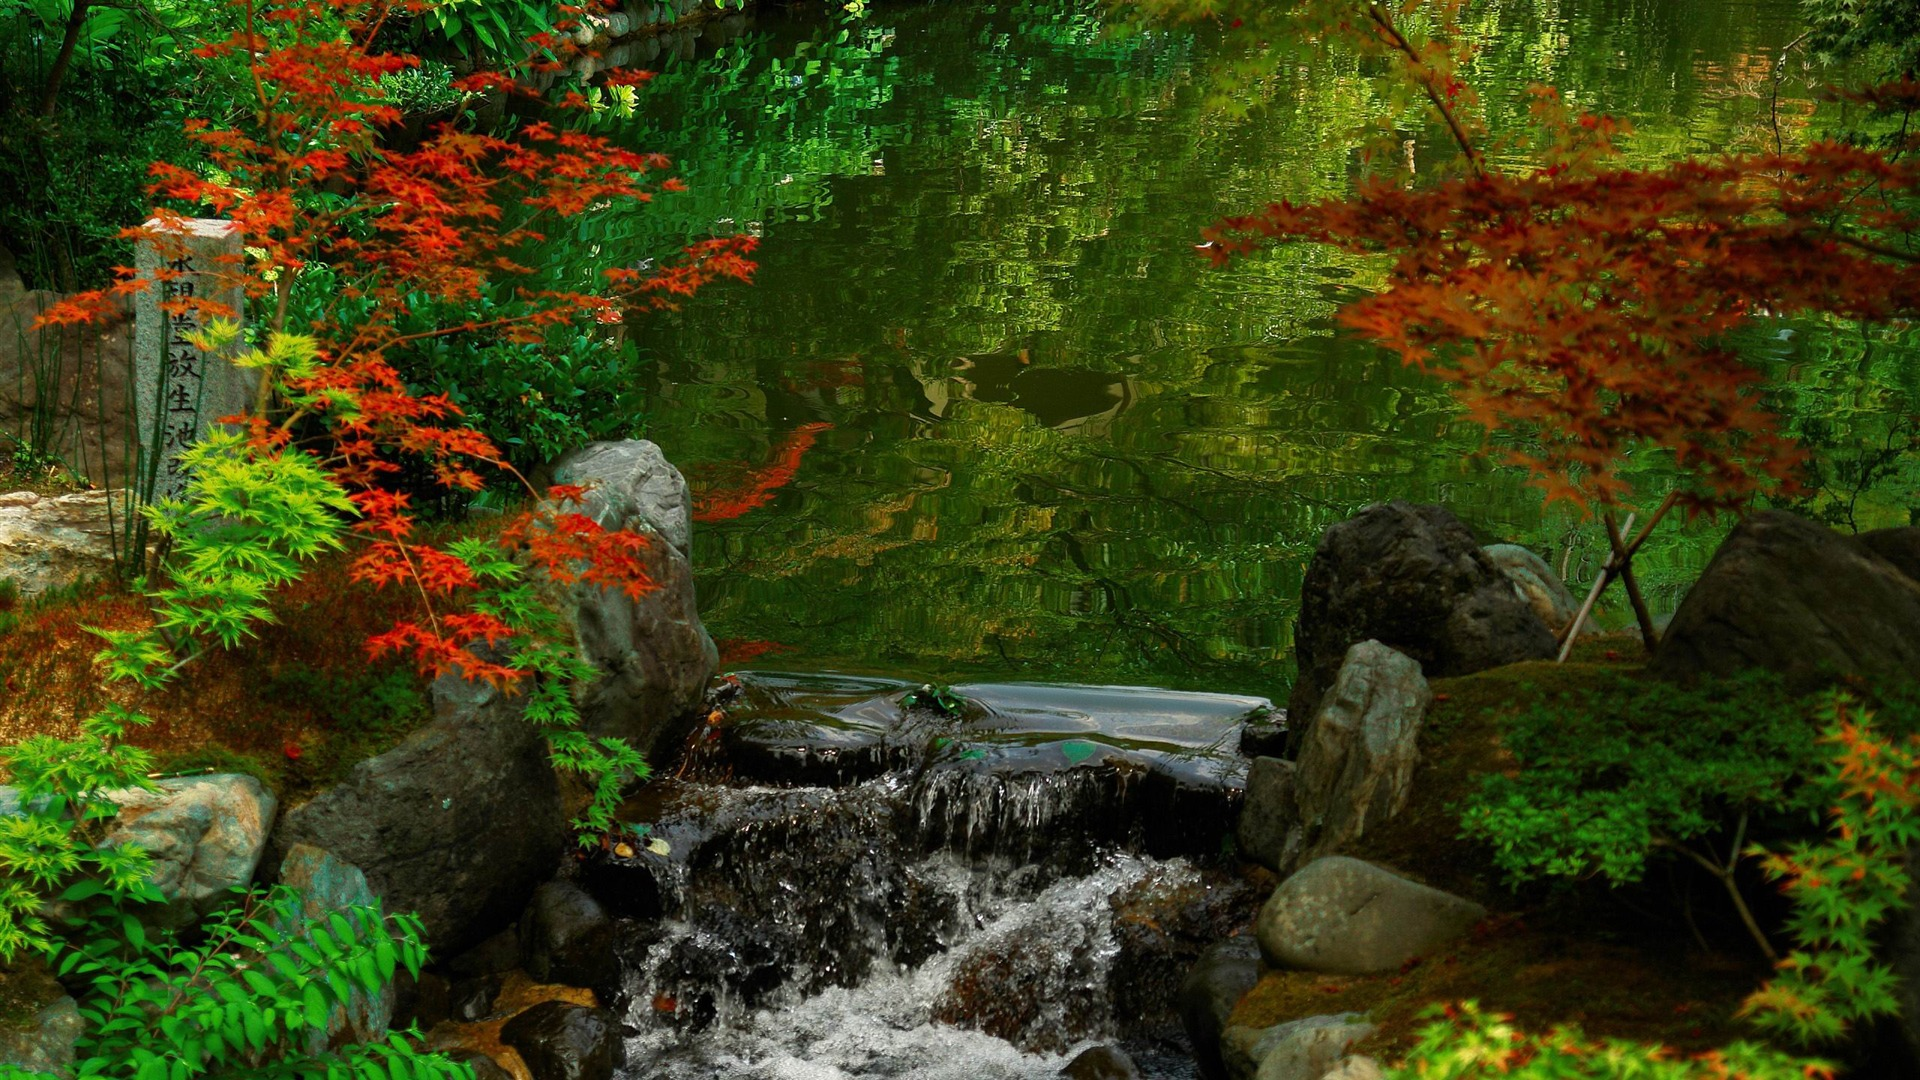 Landscape / kyoto garden-Japan Landscape Wallpaper